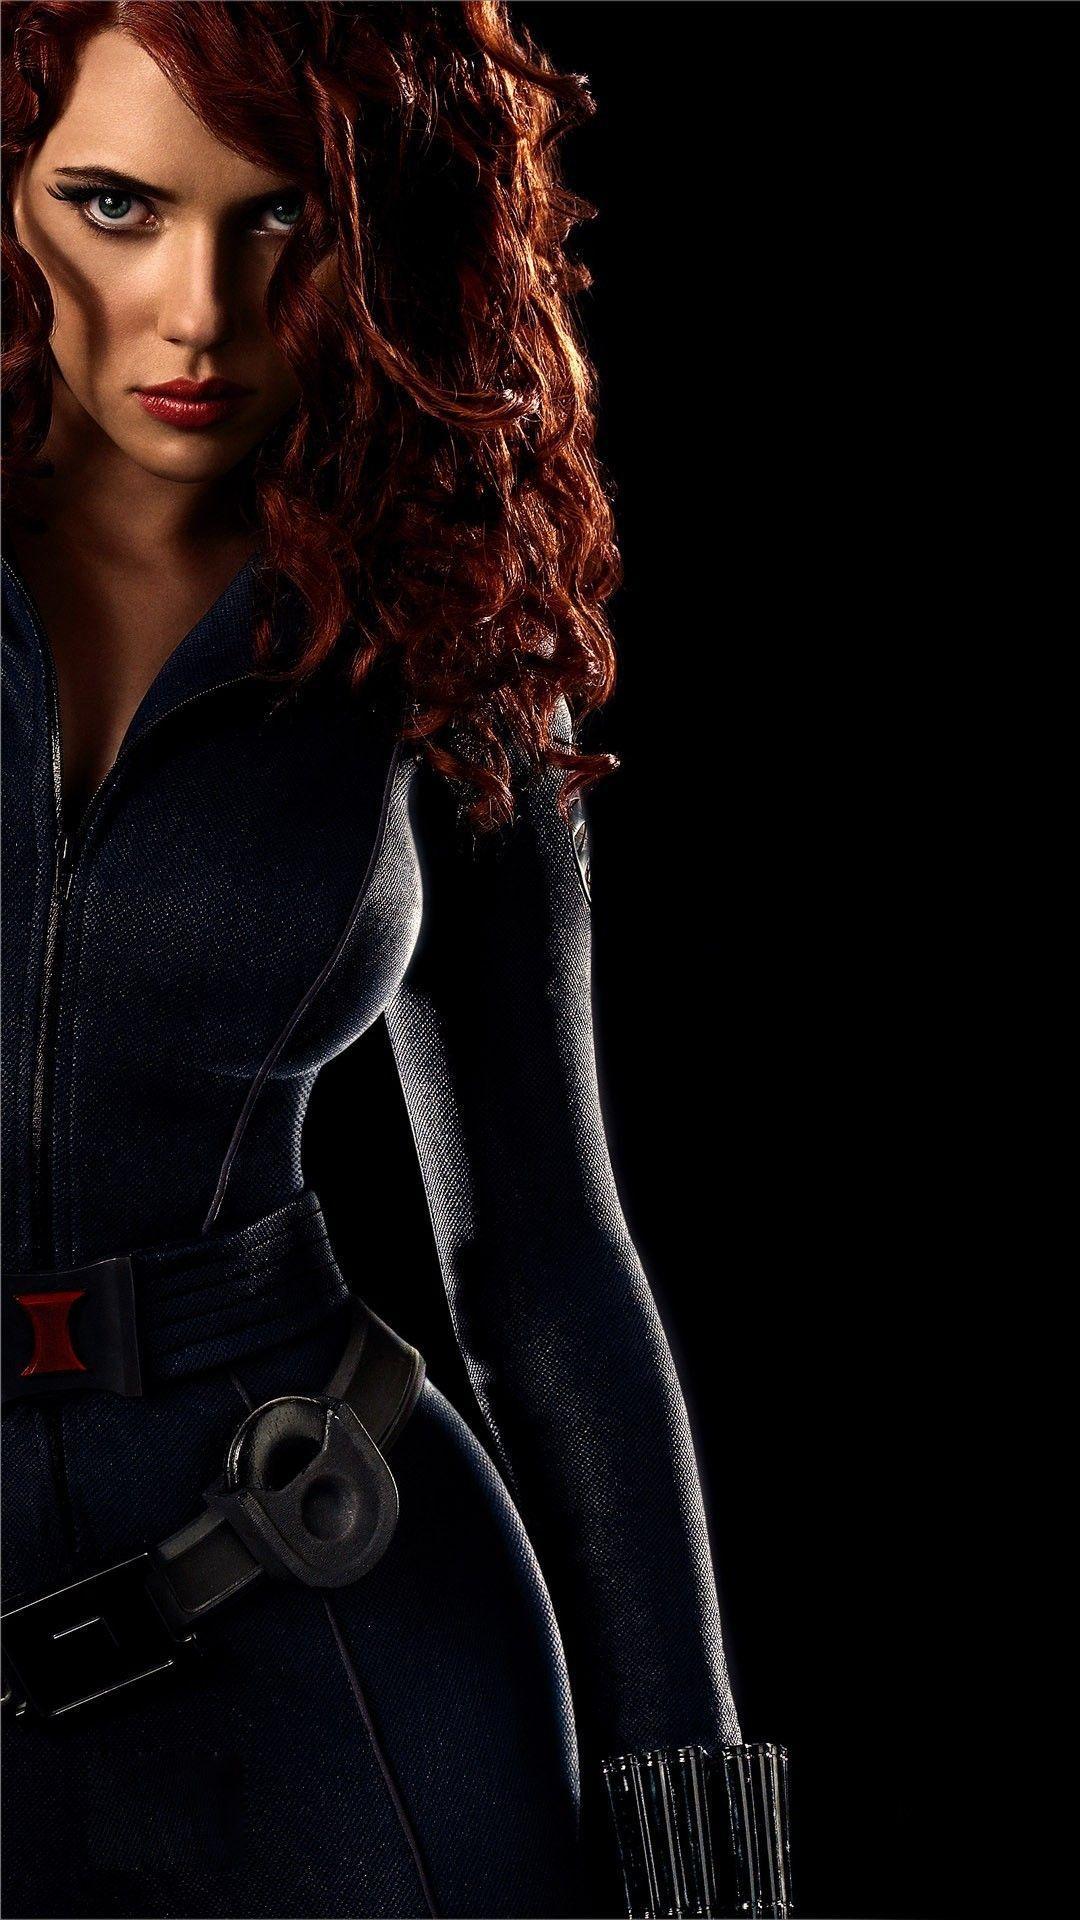 Black Widow Wallpaper Picture Trm Movie Desktop Hd Wallpapers